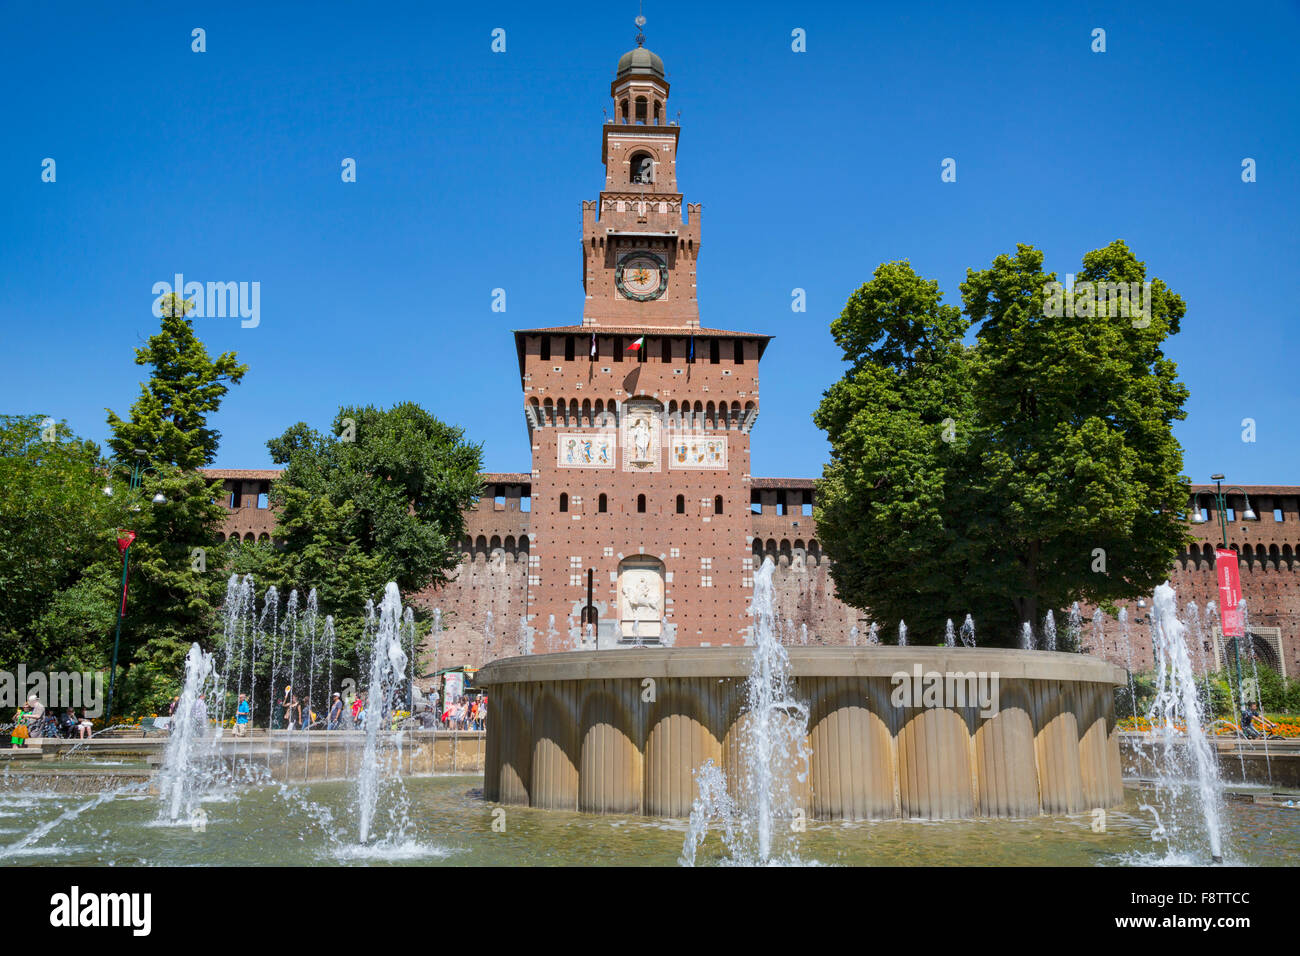 La Province de Milan, Milan, Lombardie, Italie. Château Sforzesco. Castello Sforzesco. L'entrée au Photo Stock